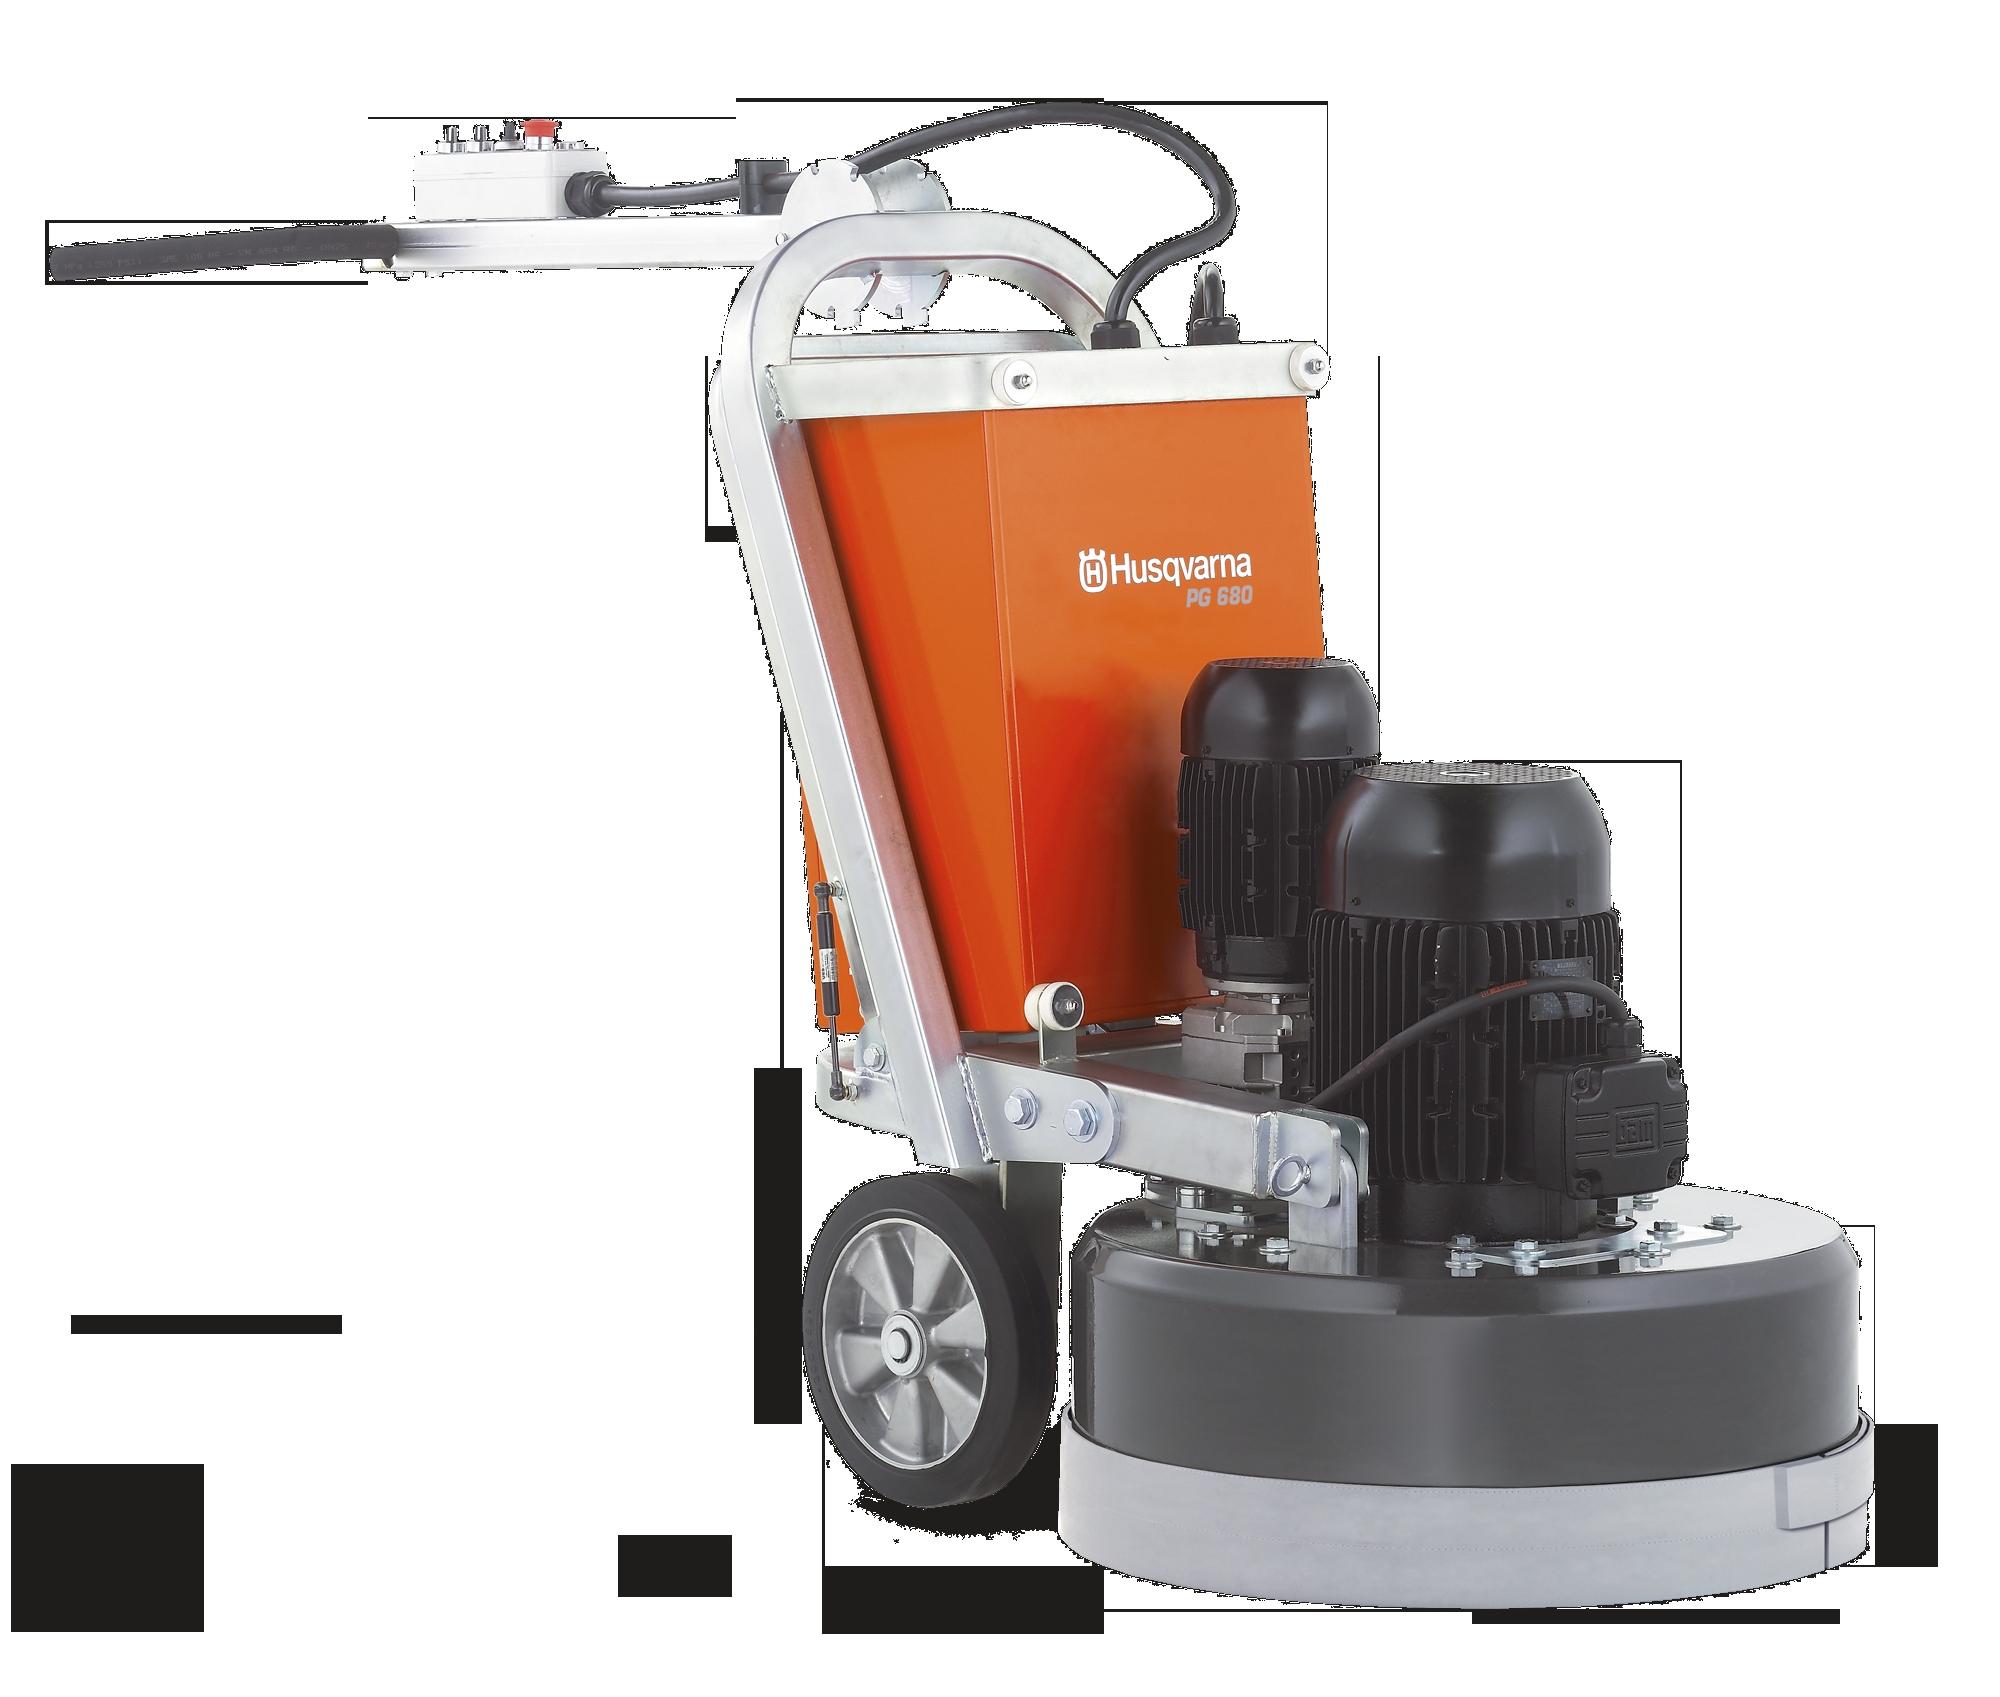 Husqvarna Floor Grinder Pg 400 Husqvarna Floor Grinders Polishing Pg 680